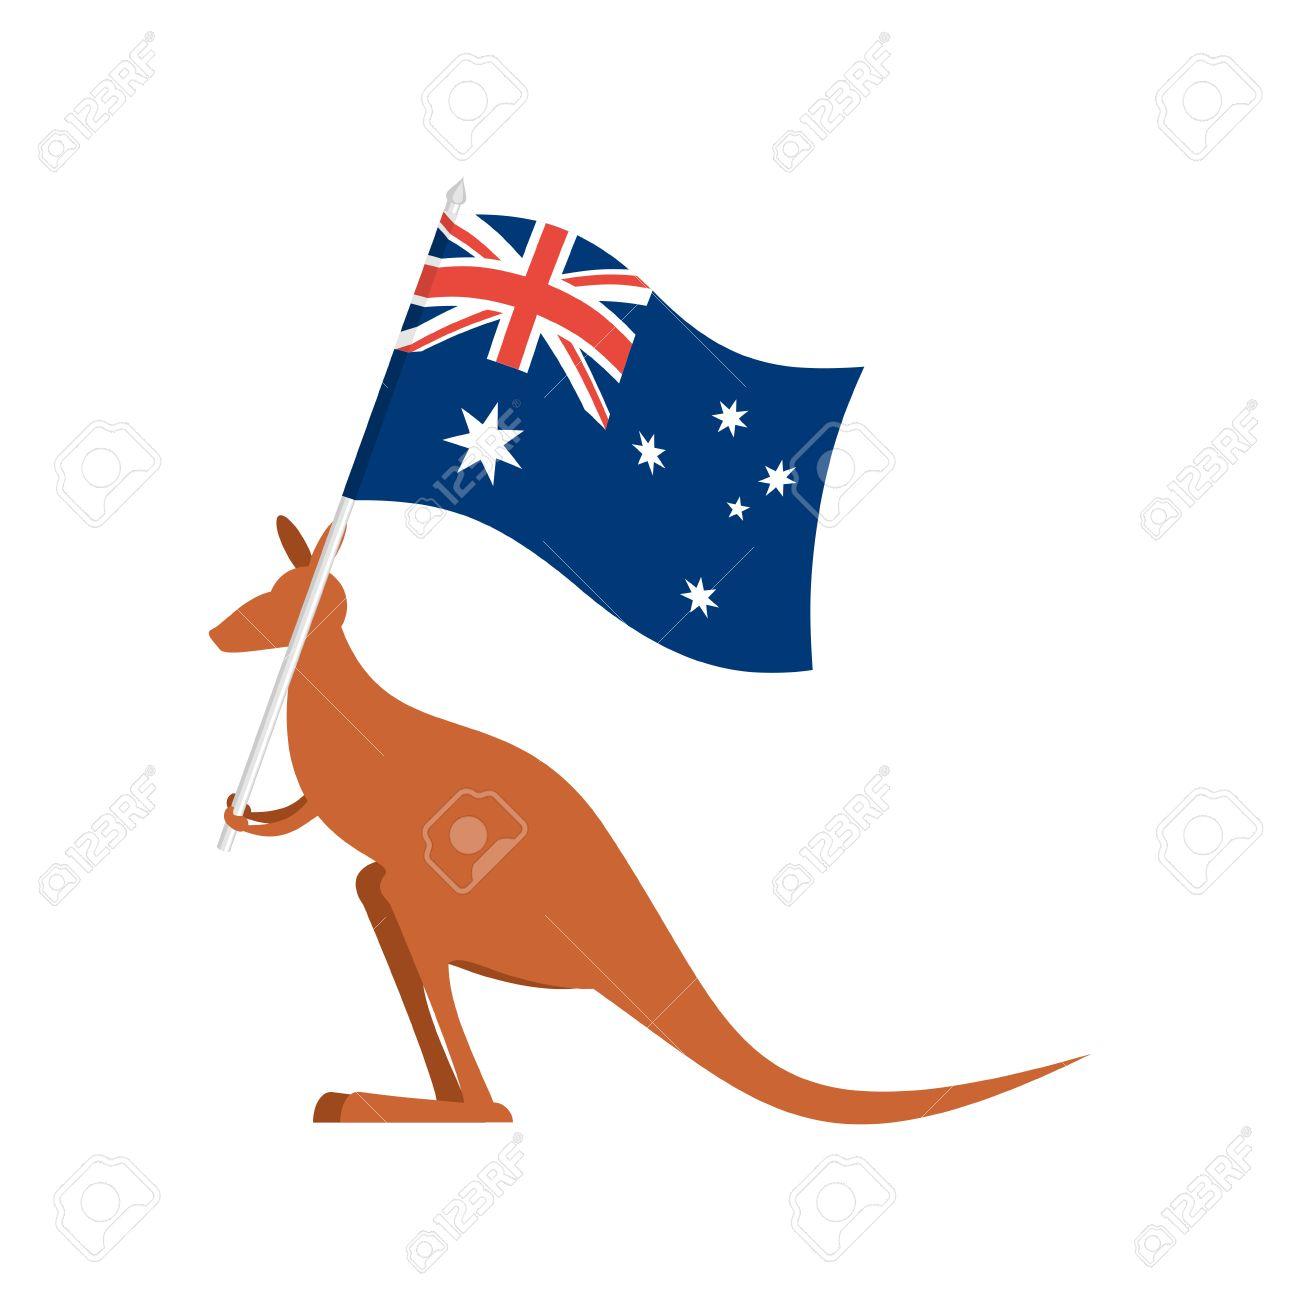 Kangaroos and Australian flag. wallaby for Australia Day emblem.